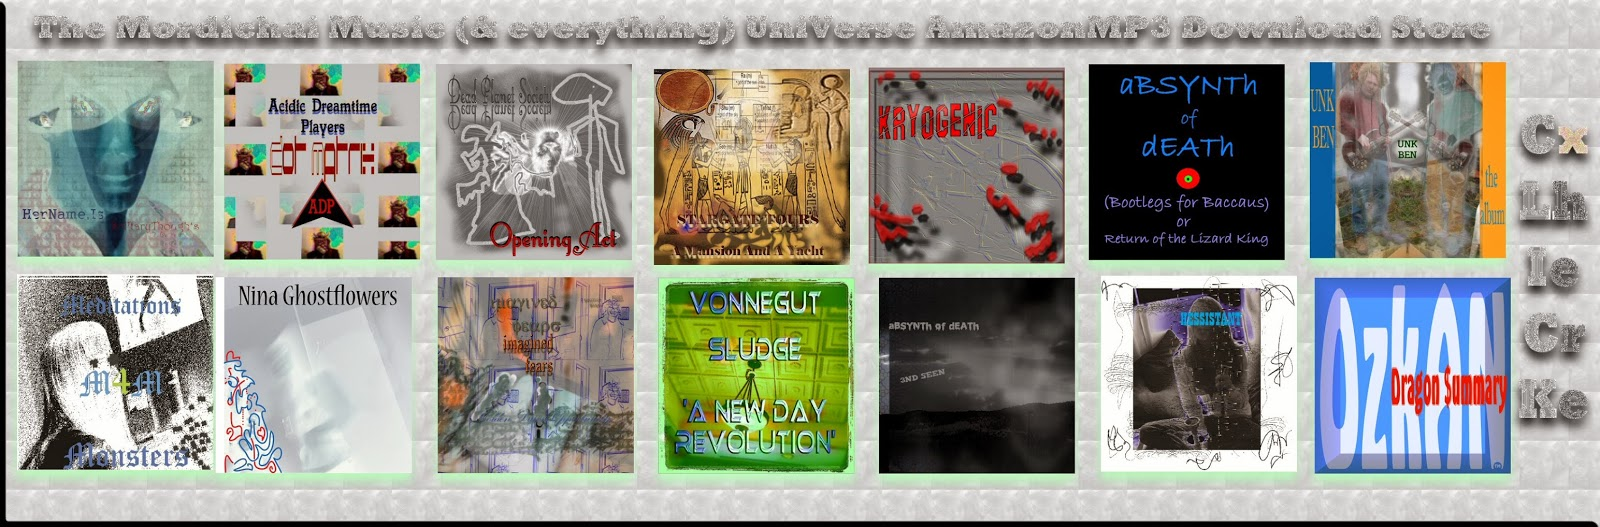 http://bit.ly/GreatMusicCatalog